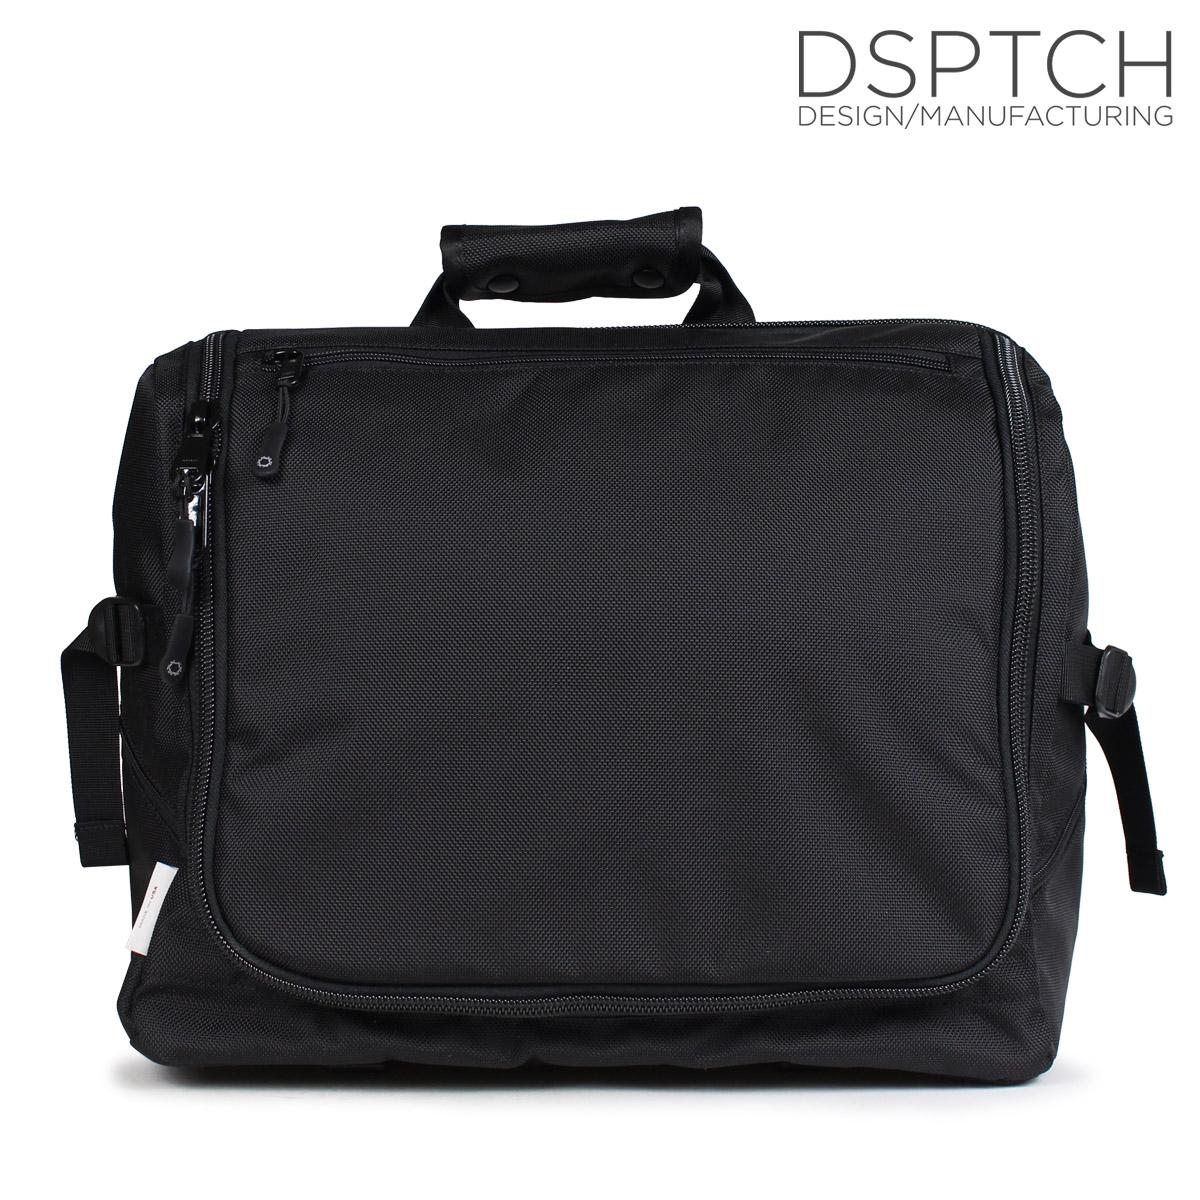 Dsptch Dispatch Bag Messenger Shoulder Tech 20l Men S Lady Black Pck Tm 10 9 Shinnyu Load